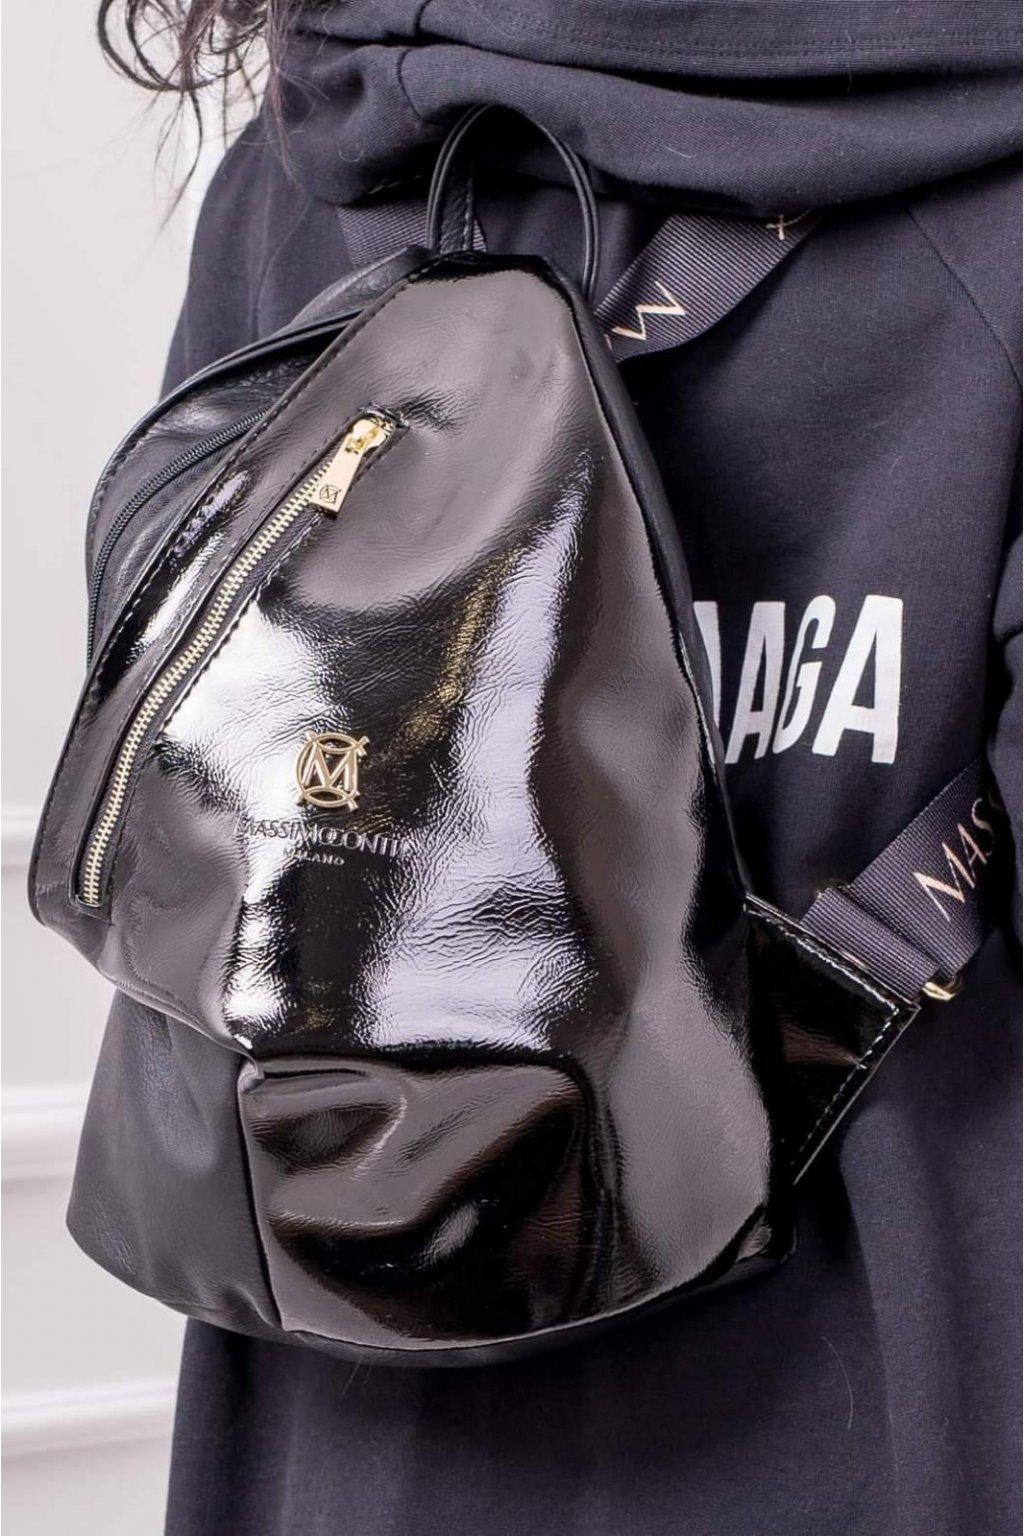 Batoh massimo contti černý italy style fashion